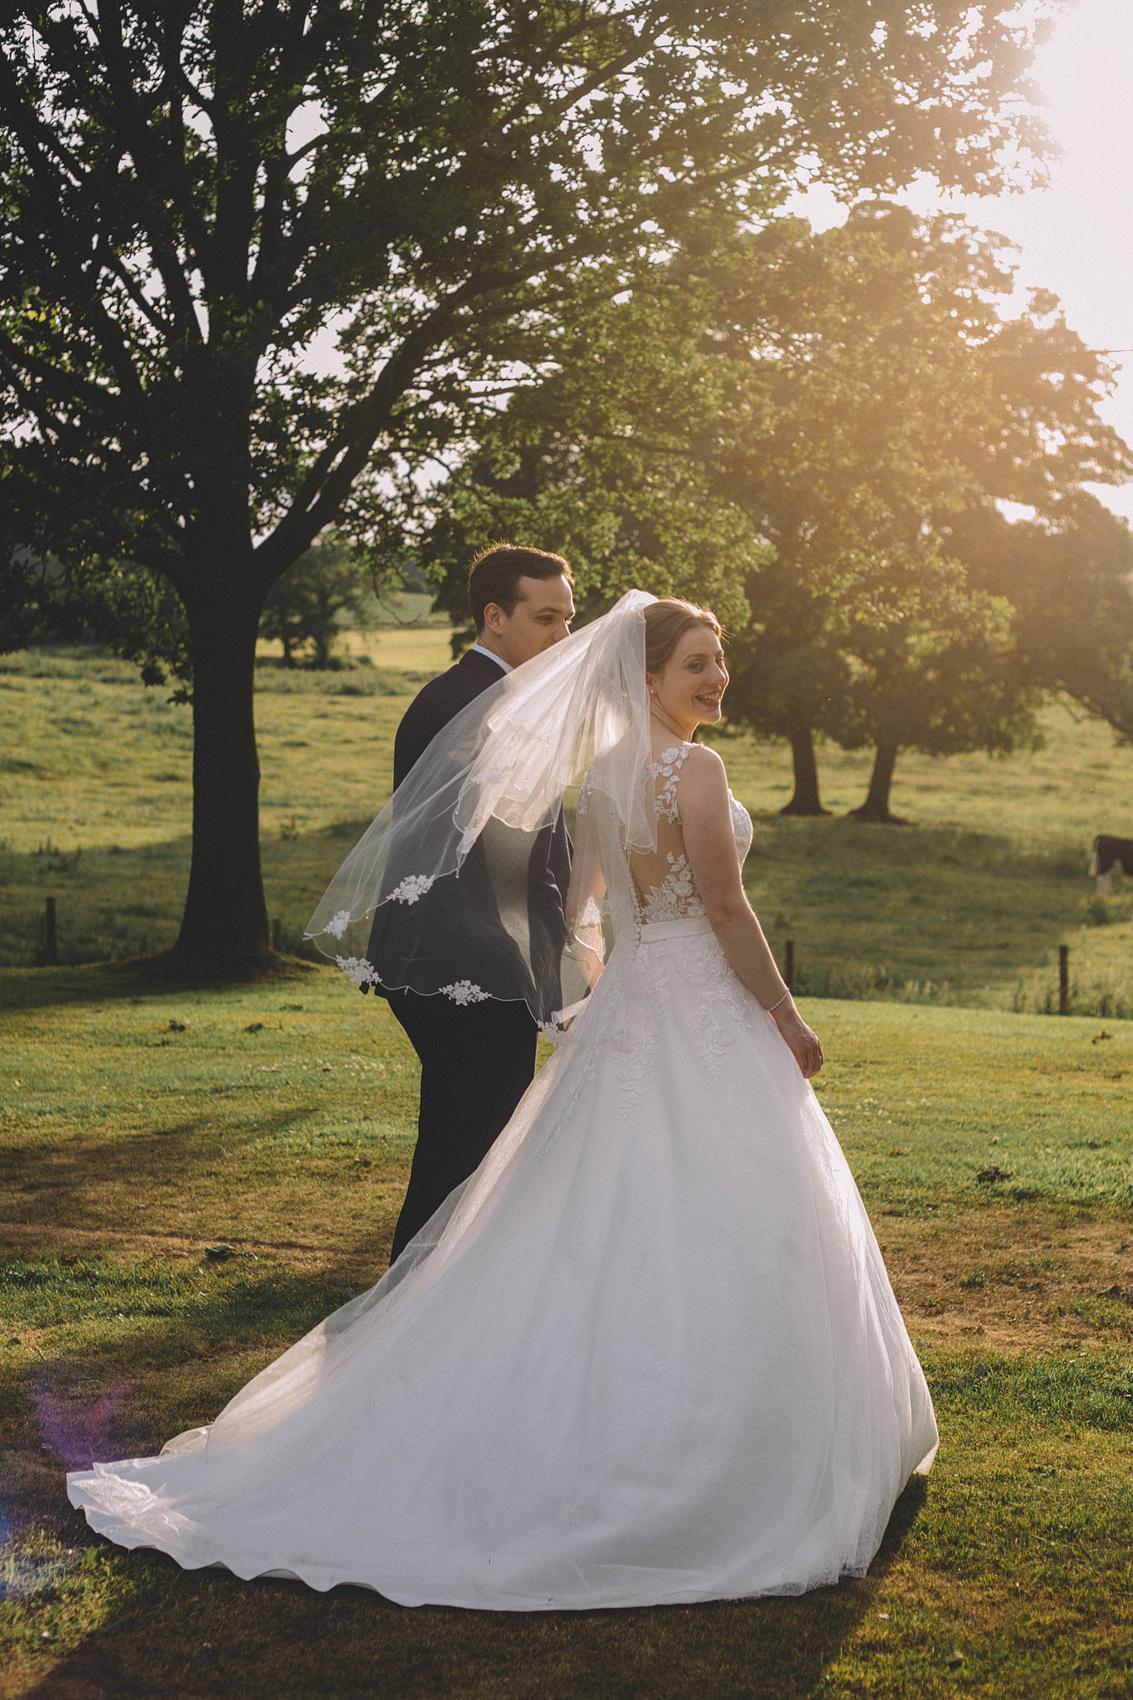 Dilhorne_Village_Hall_Wedding_Photography_-_93_.jpg